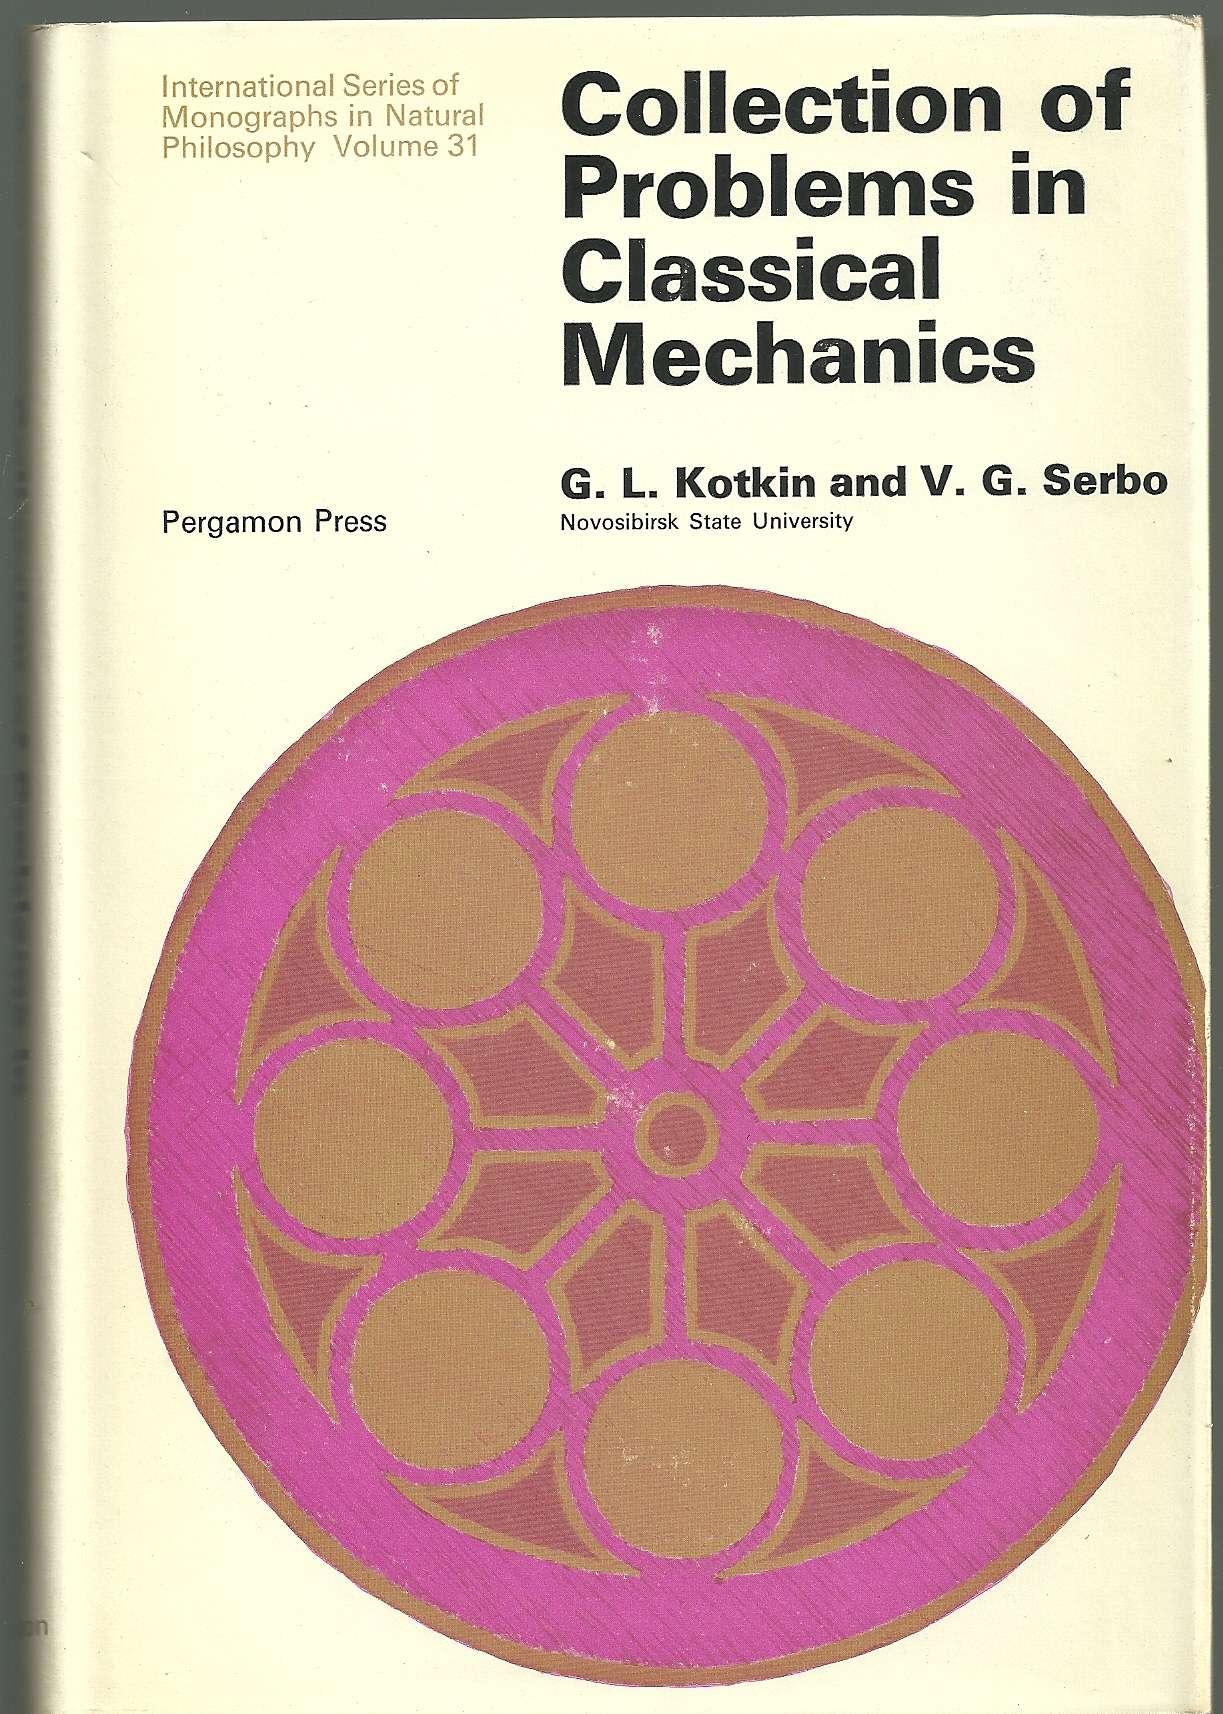 Collection of Problems in Classical Mechanics Gleb L. Kotkin, V. G. Serbo